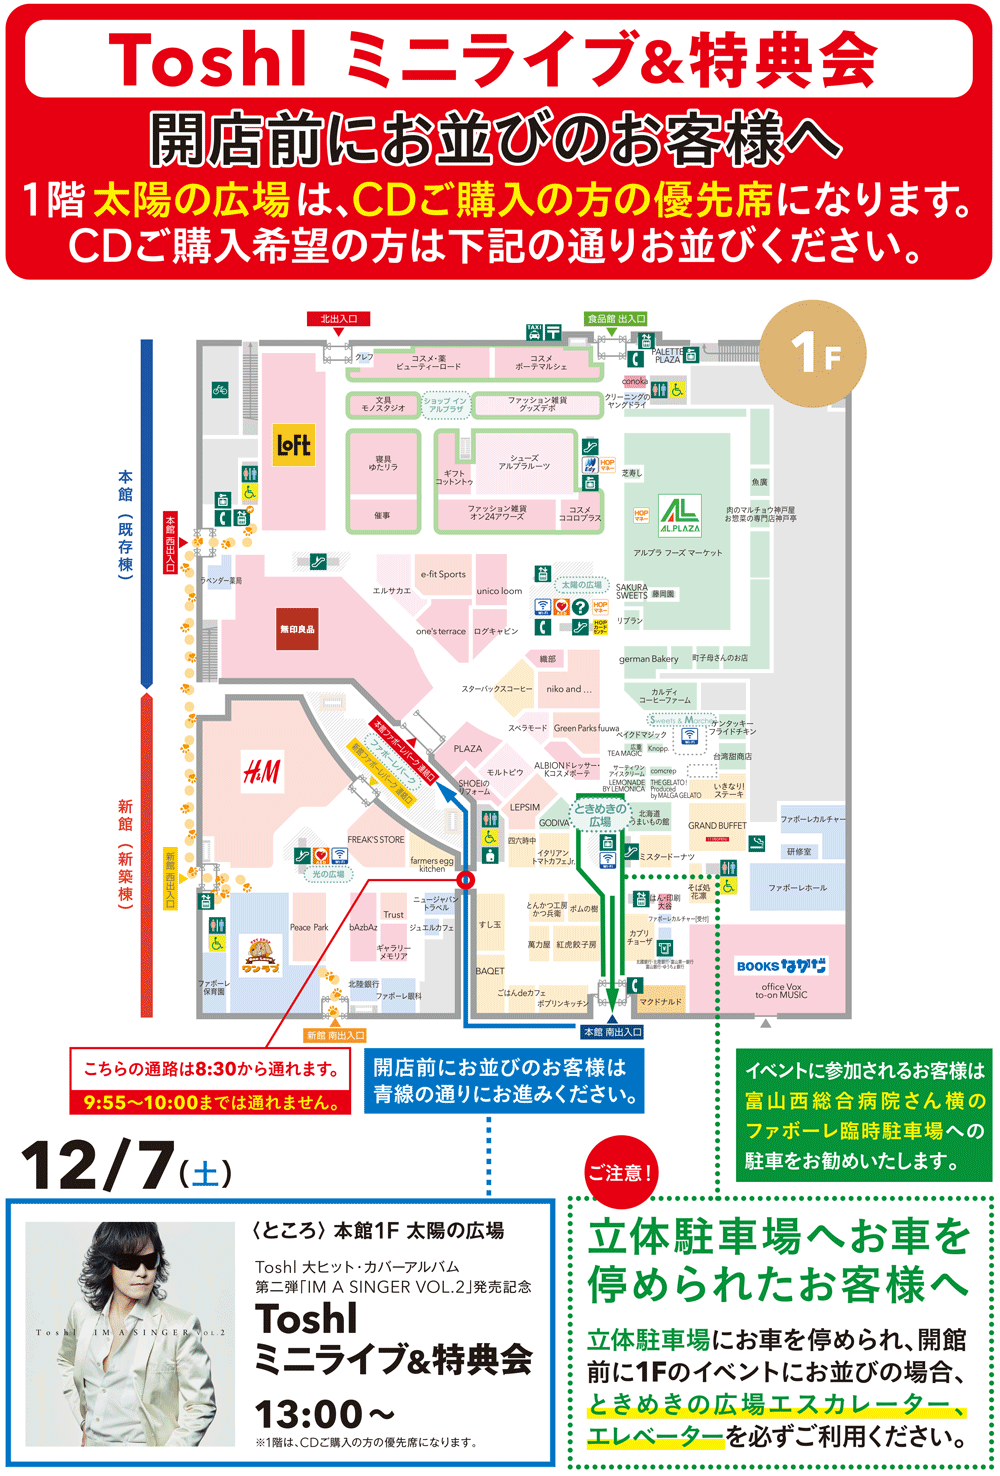 「Toshiミニライブ&特典会」ファボーレ富山の並ぶ場所